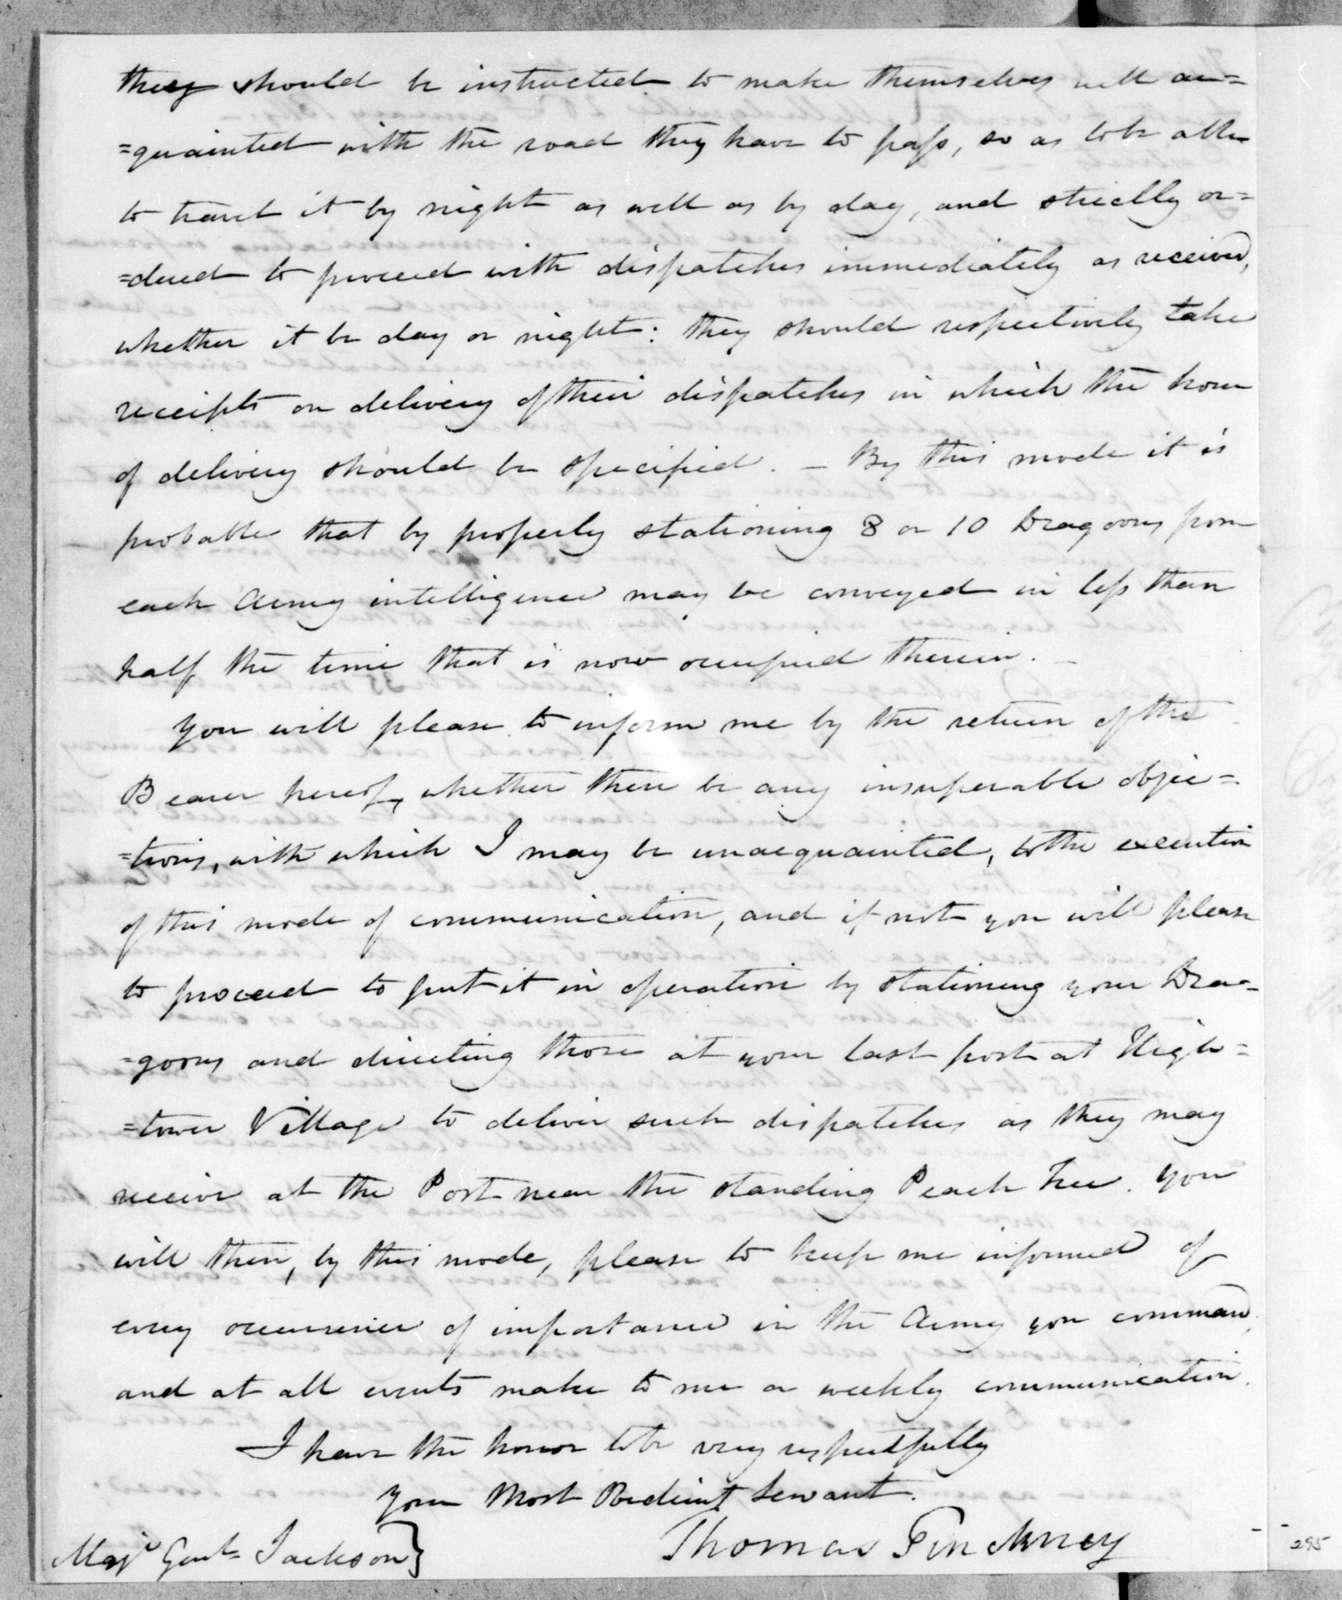 Thomas Pinckney to Andrew Jackson, January 26, 1814